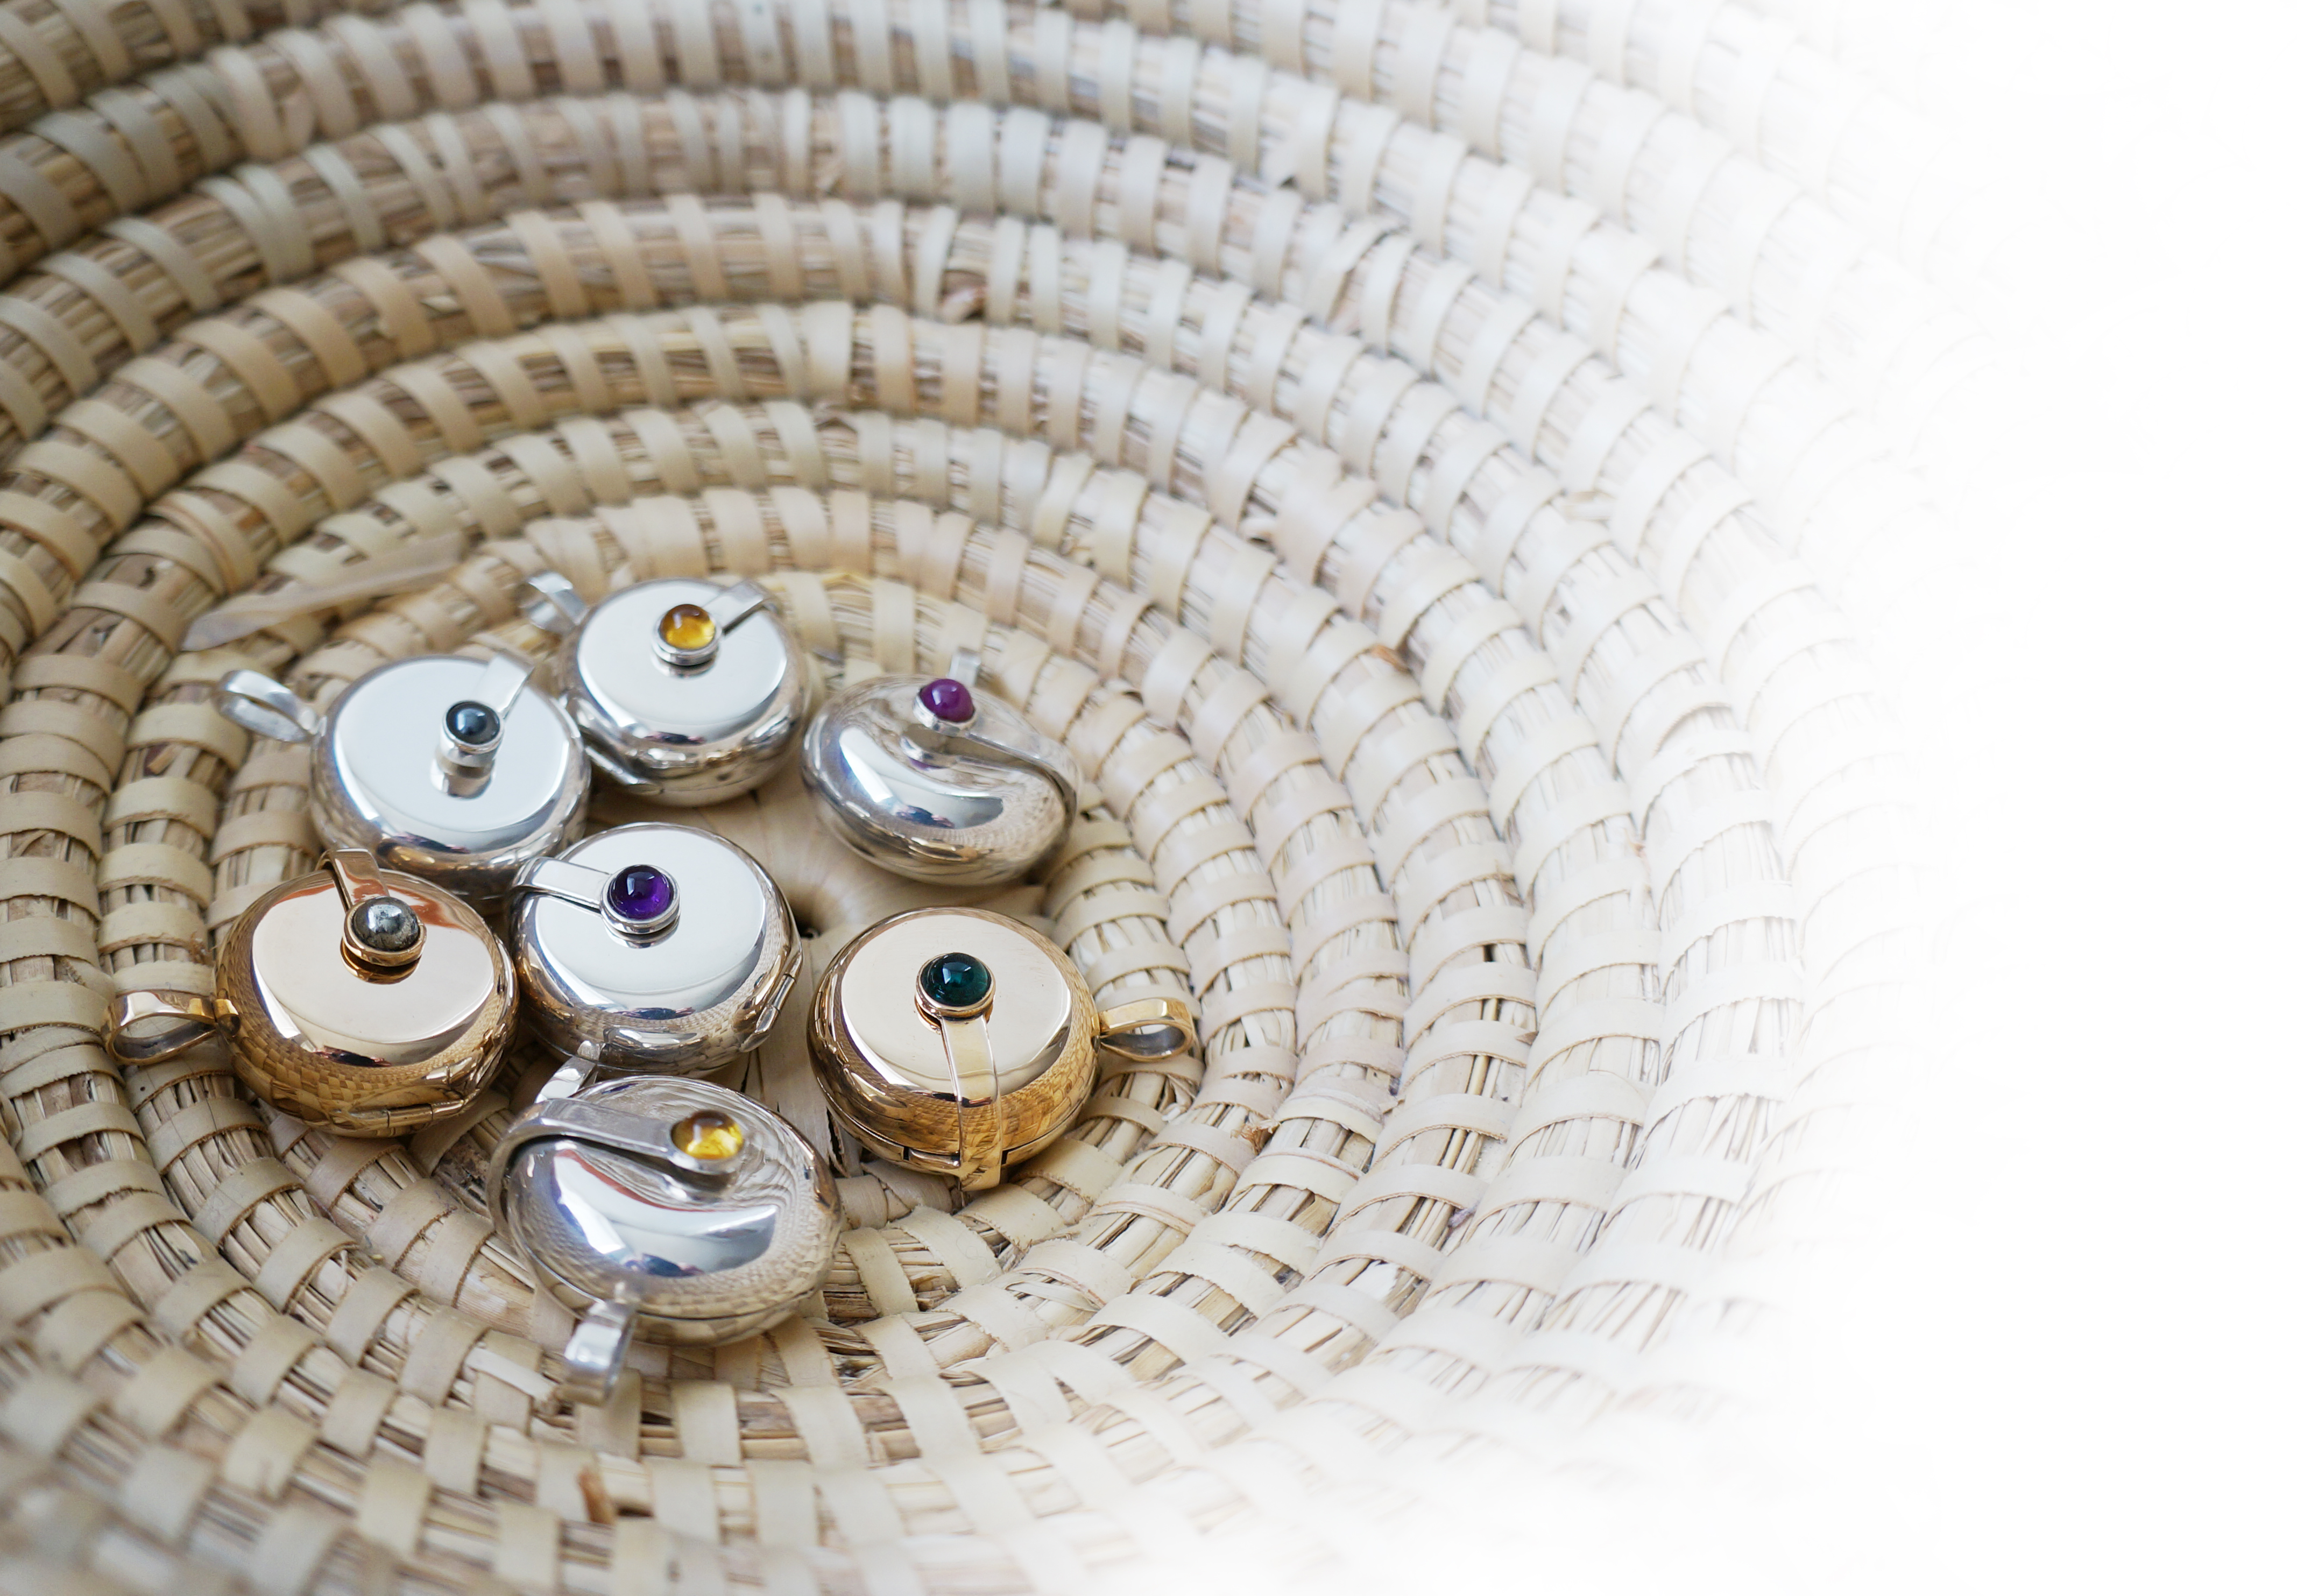 Cornucopia of lockets blanc tranparent BCKGD